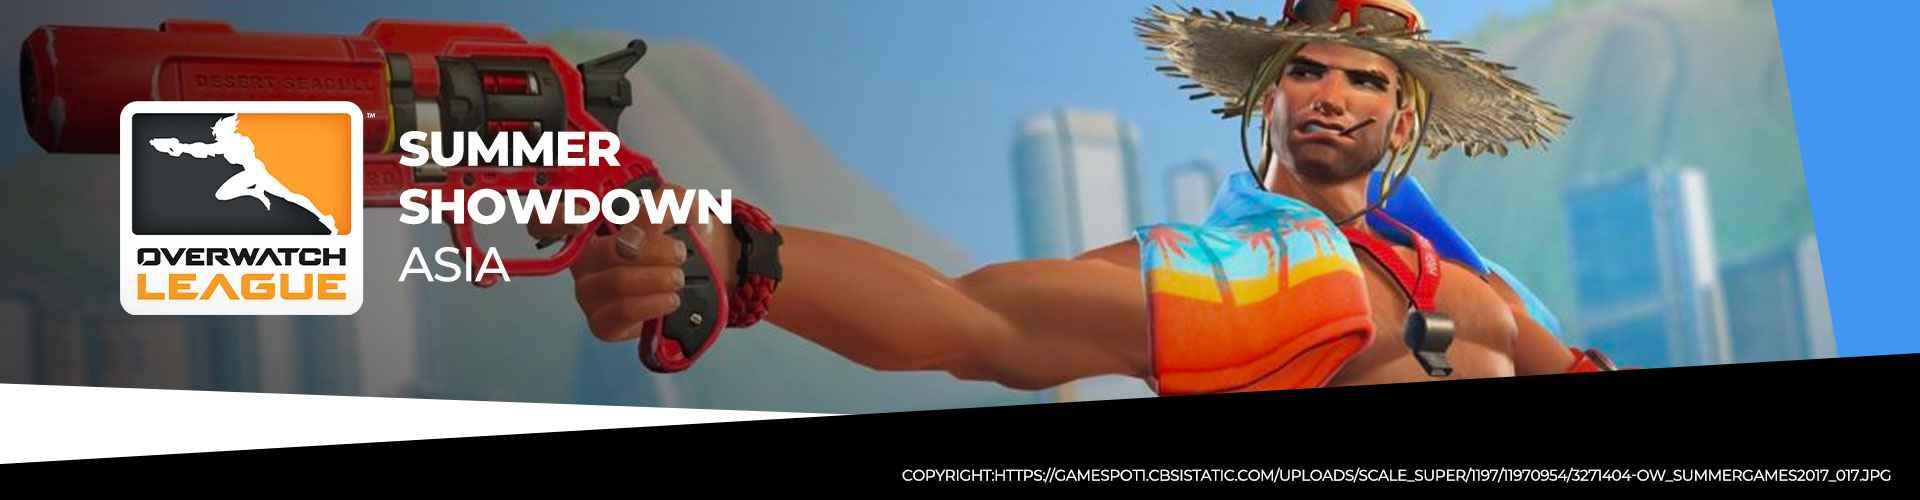 OWL Summer Showdown - Aasia